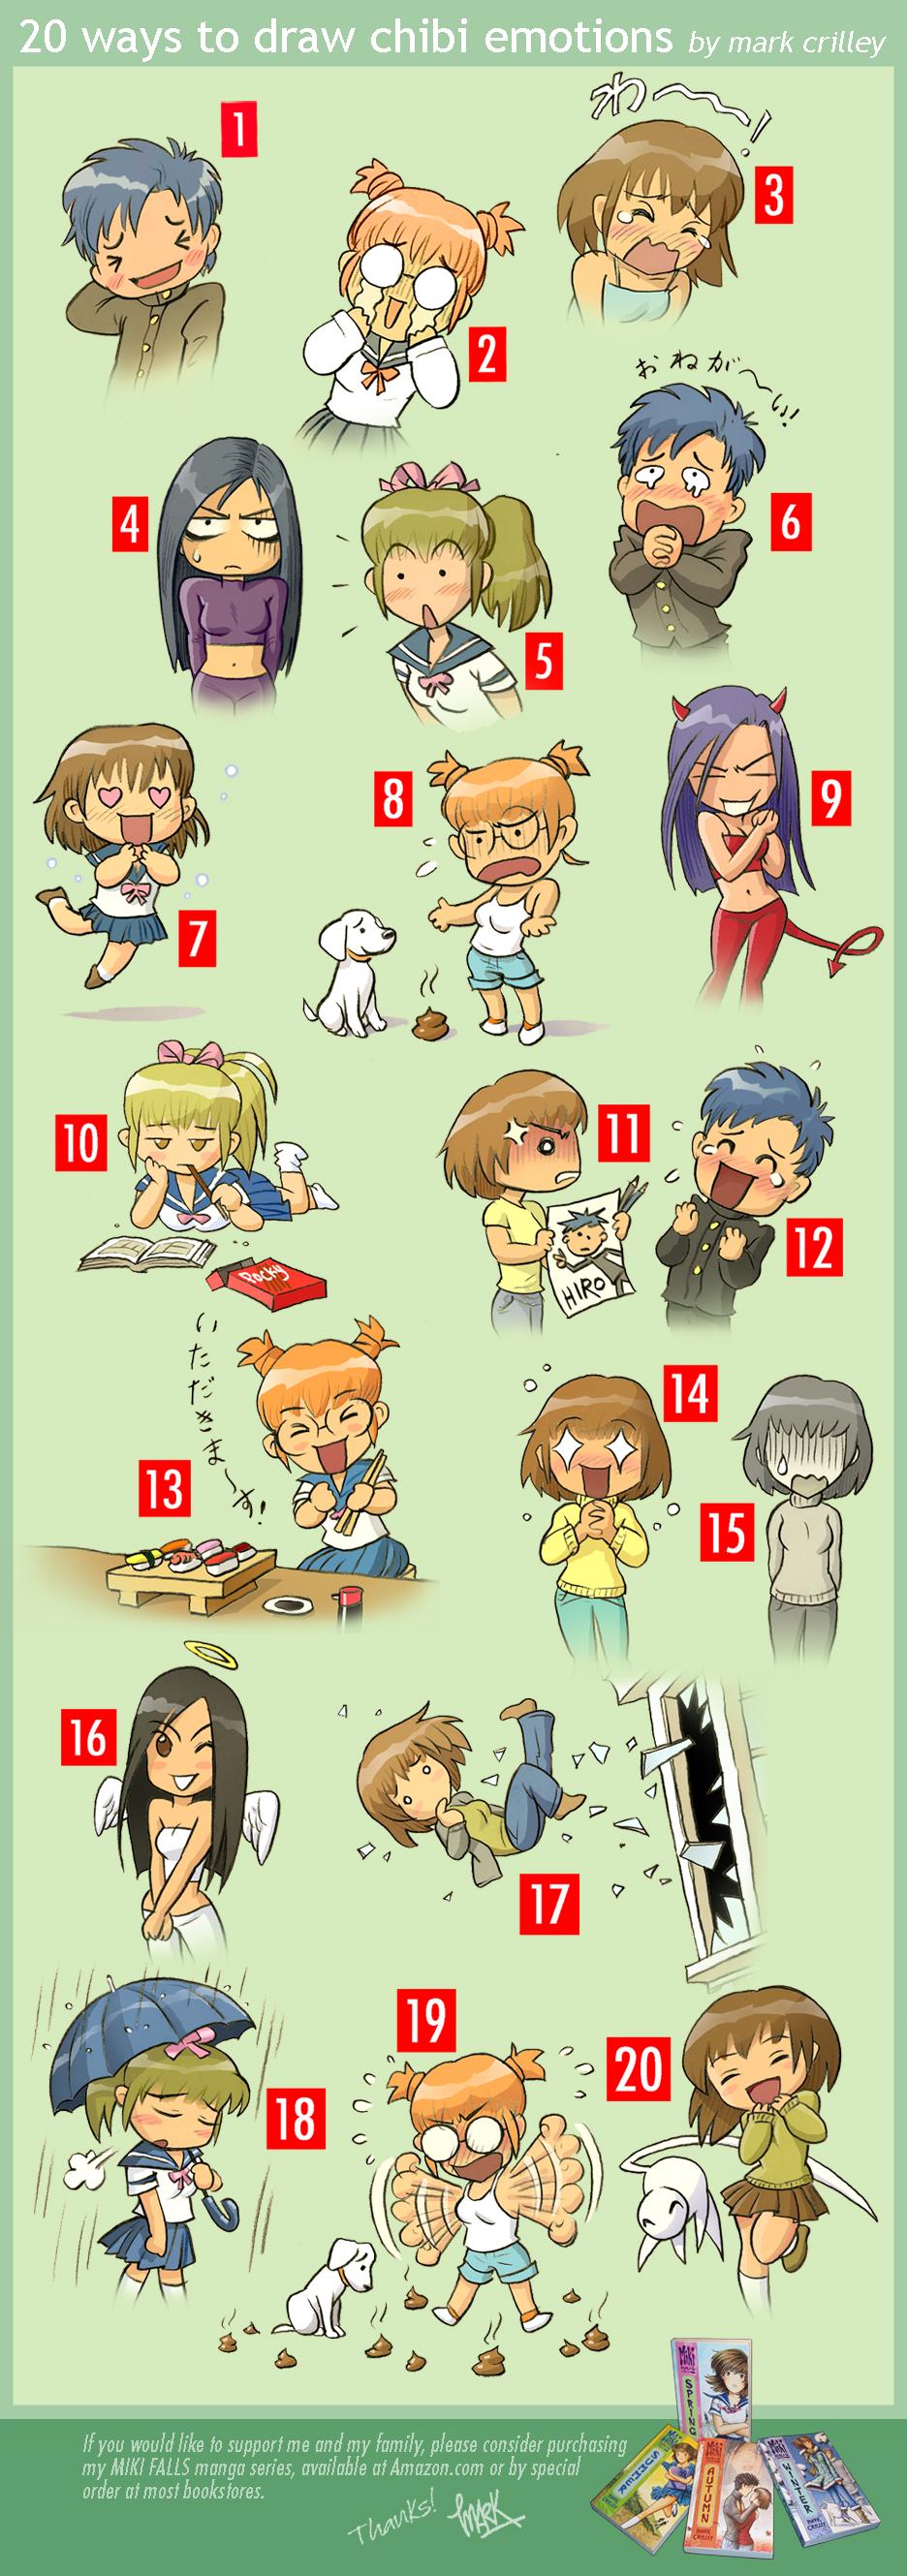 20 Ways to Draw Chibi Emotions by markcrilley